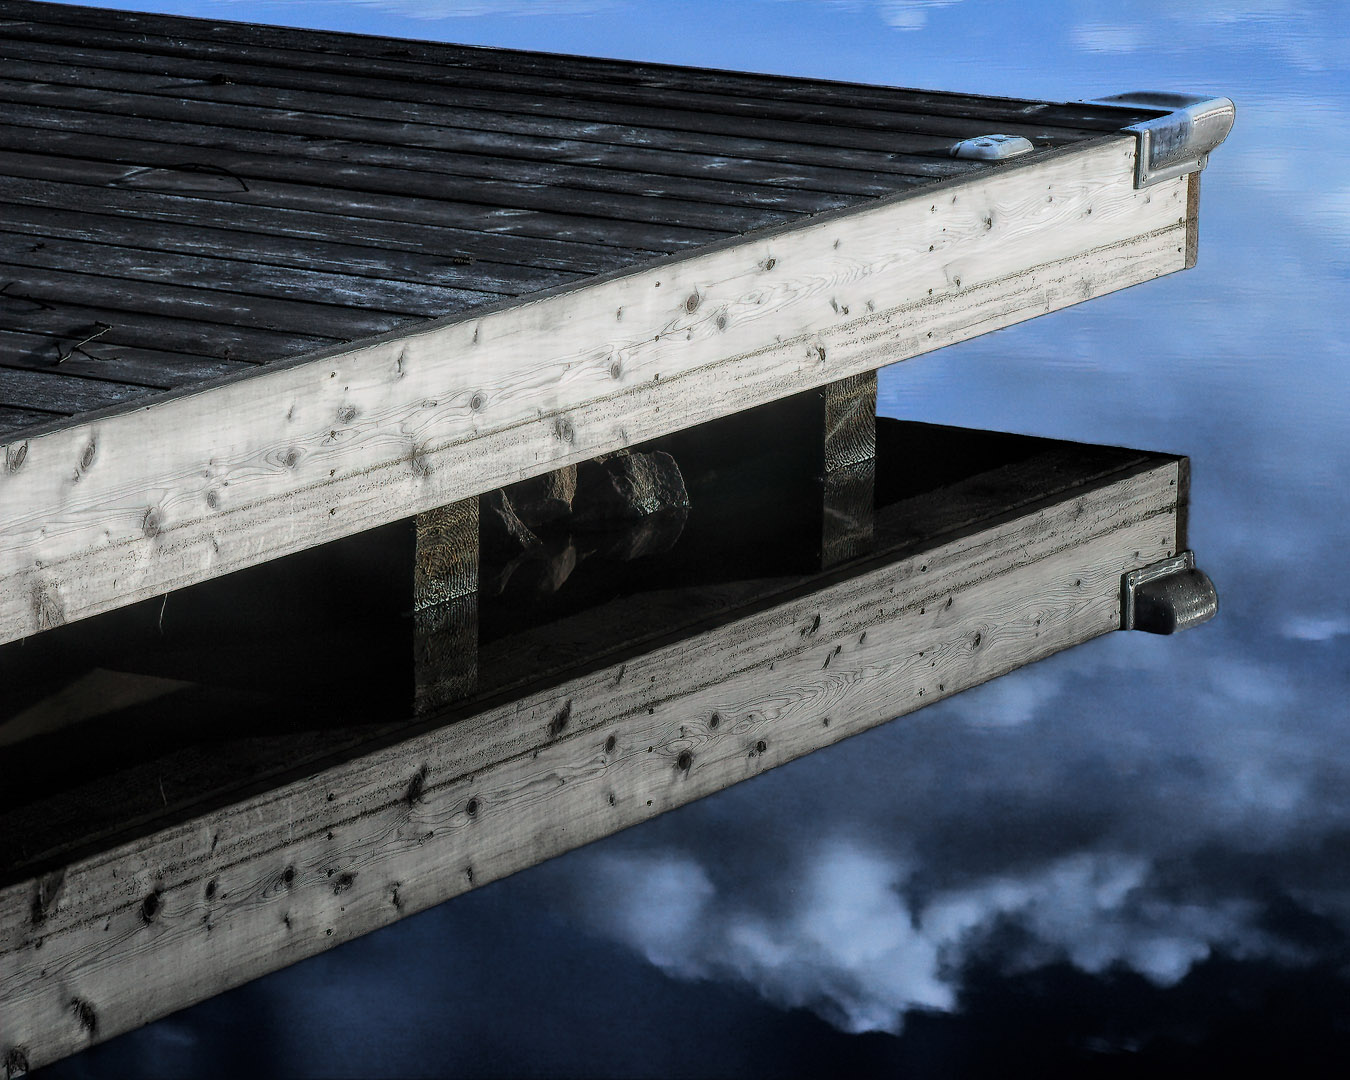 John Moore – Dock Reflections – 3RD